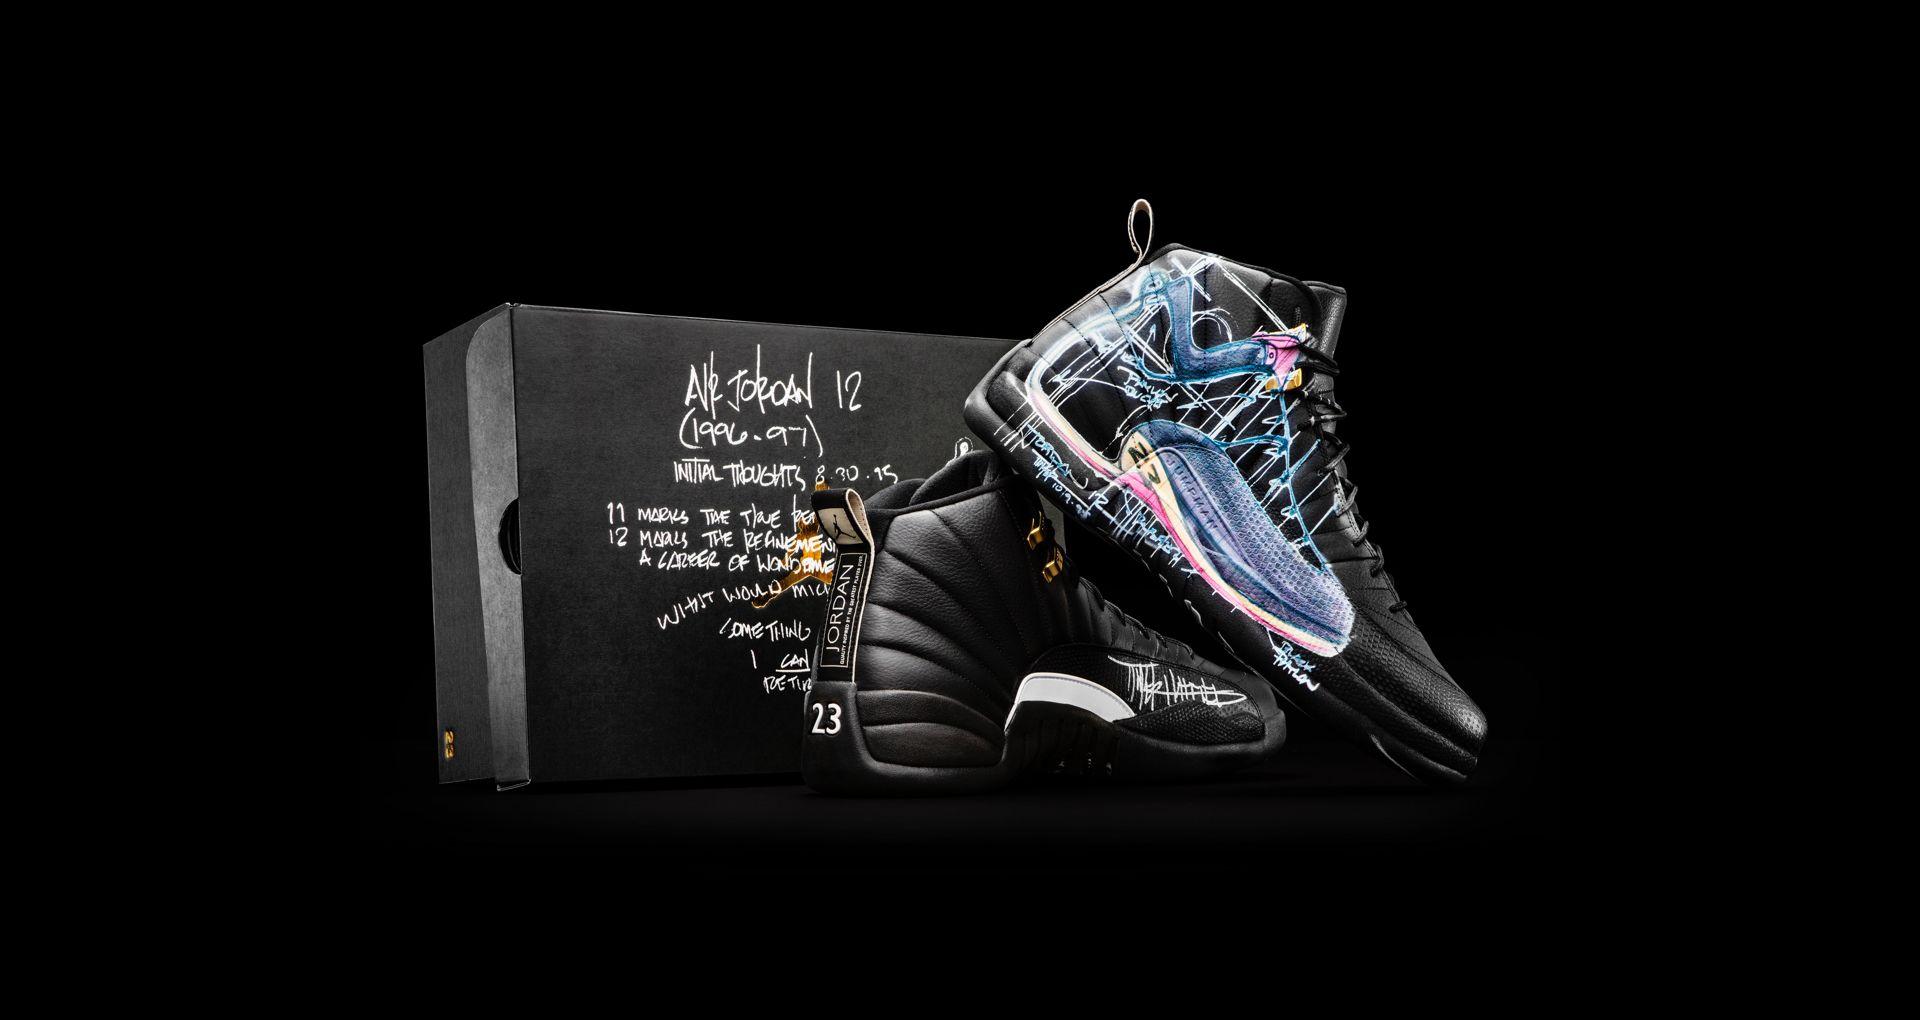 Air Jordan 12 Doernbecher 'Mark Smith' Auction  Nike+ SNKRS